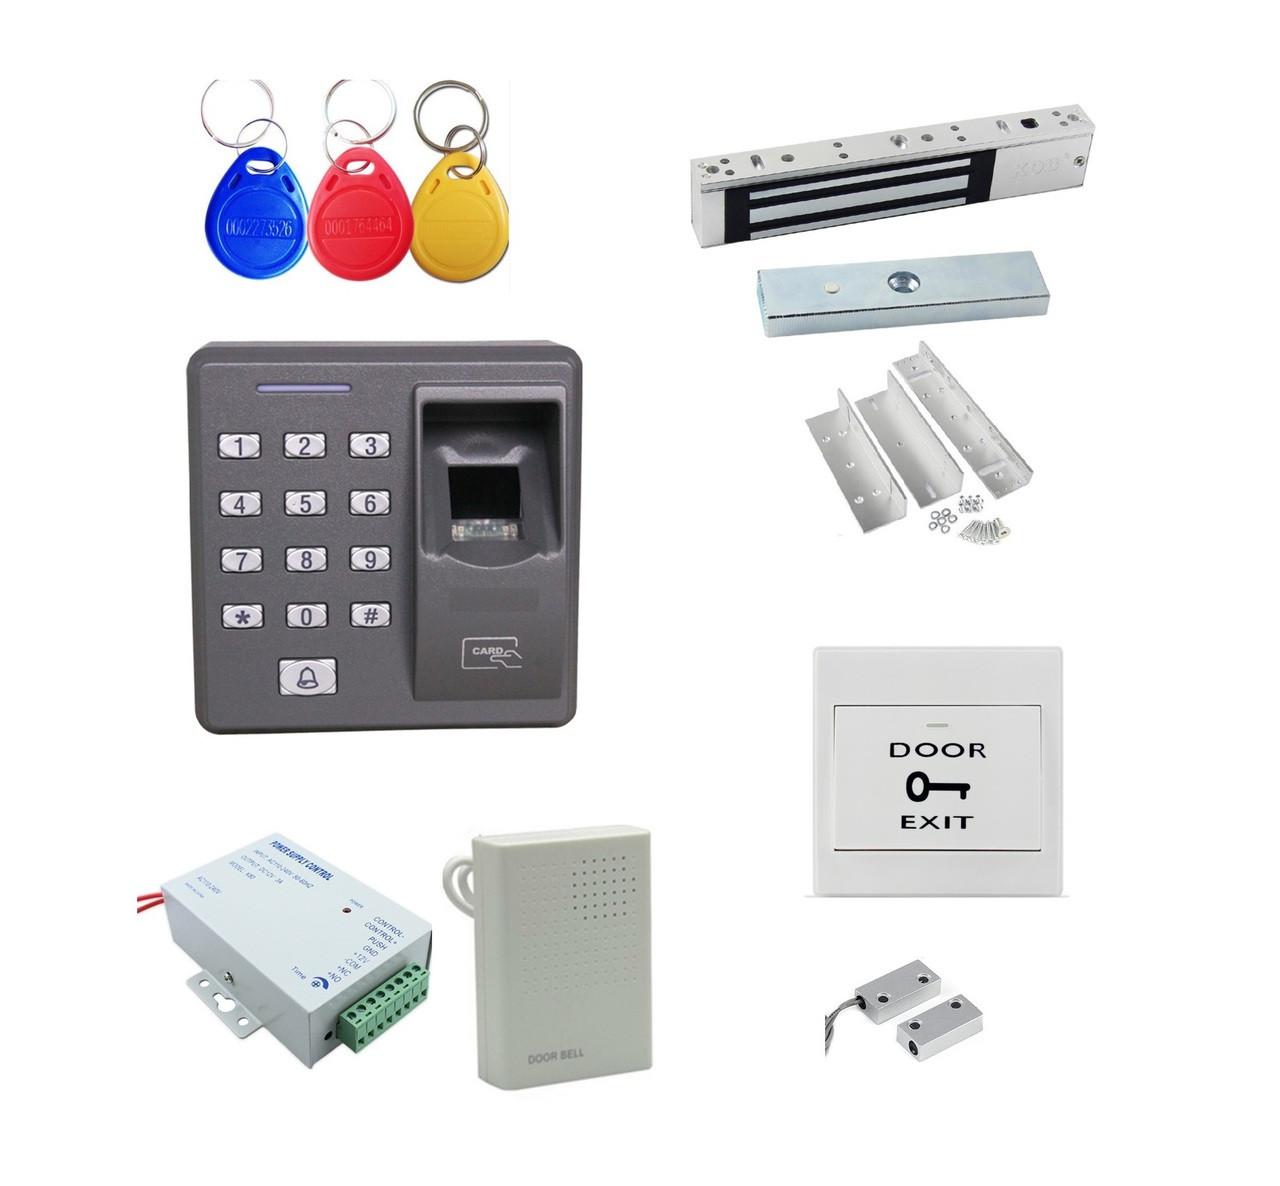 Fingerprint + Password + Id Card Biometric Access Control & Biometric Door  Lock Entry Kit (Magnetic Lock+ ZL Bracket)